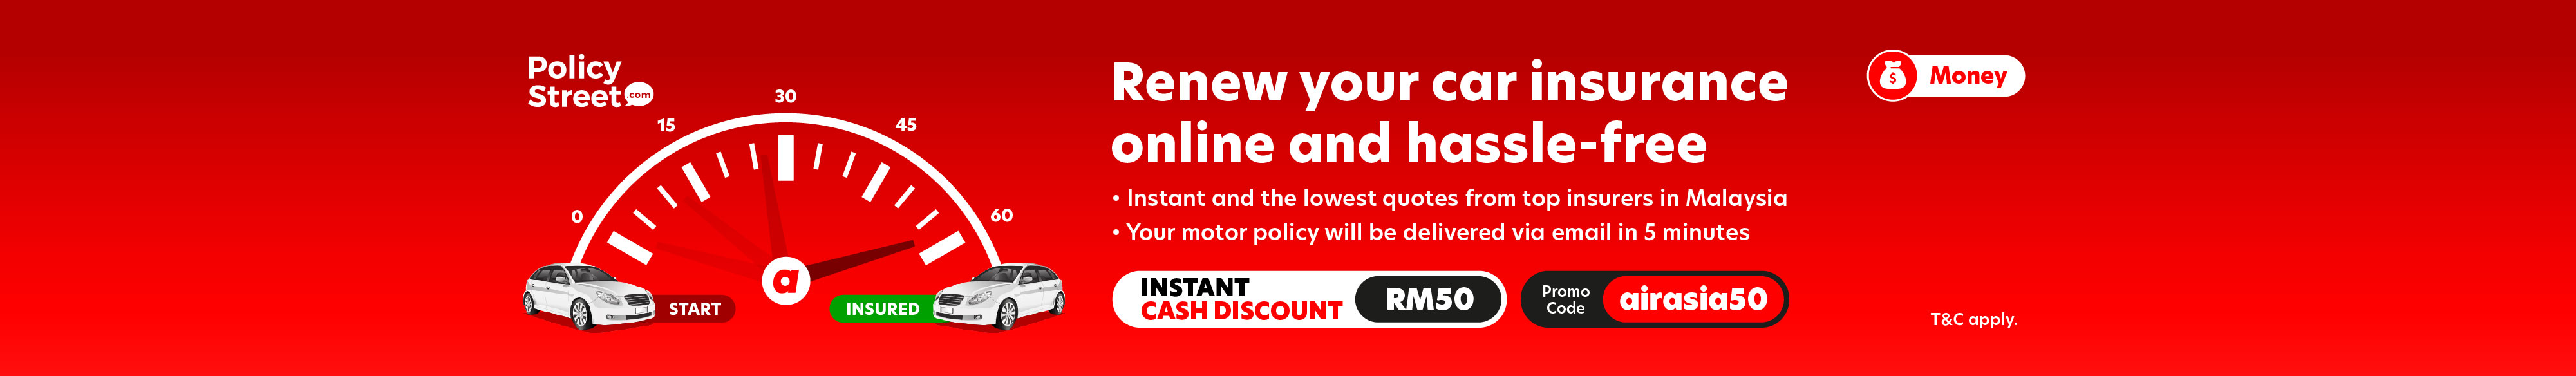 Renew car insurance-promocode